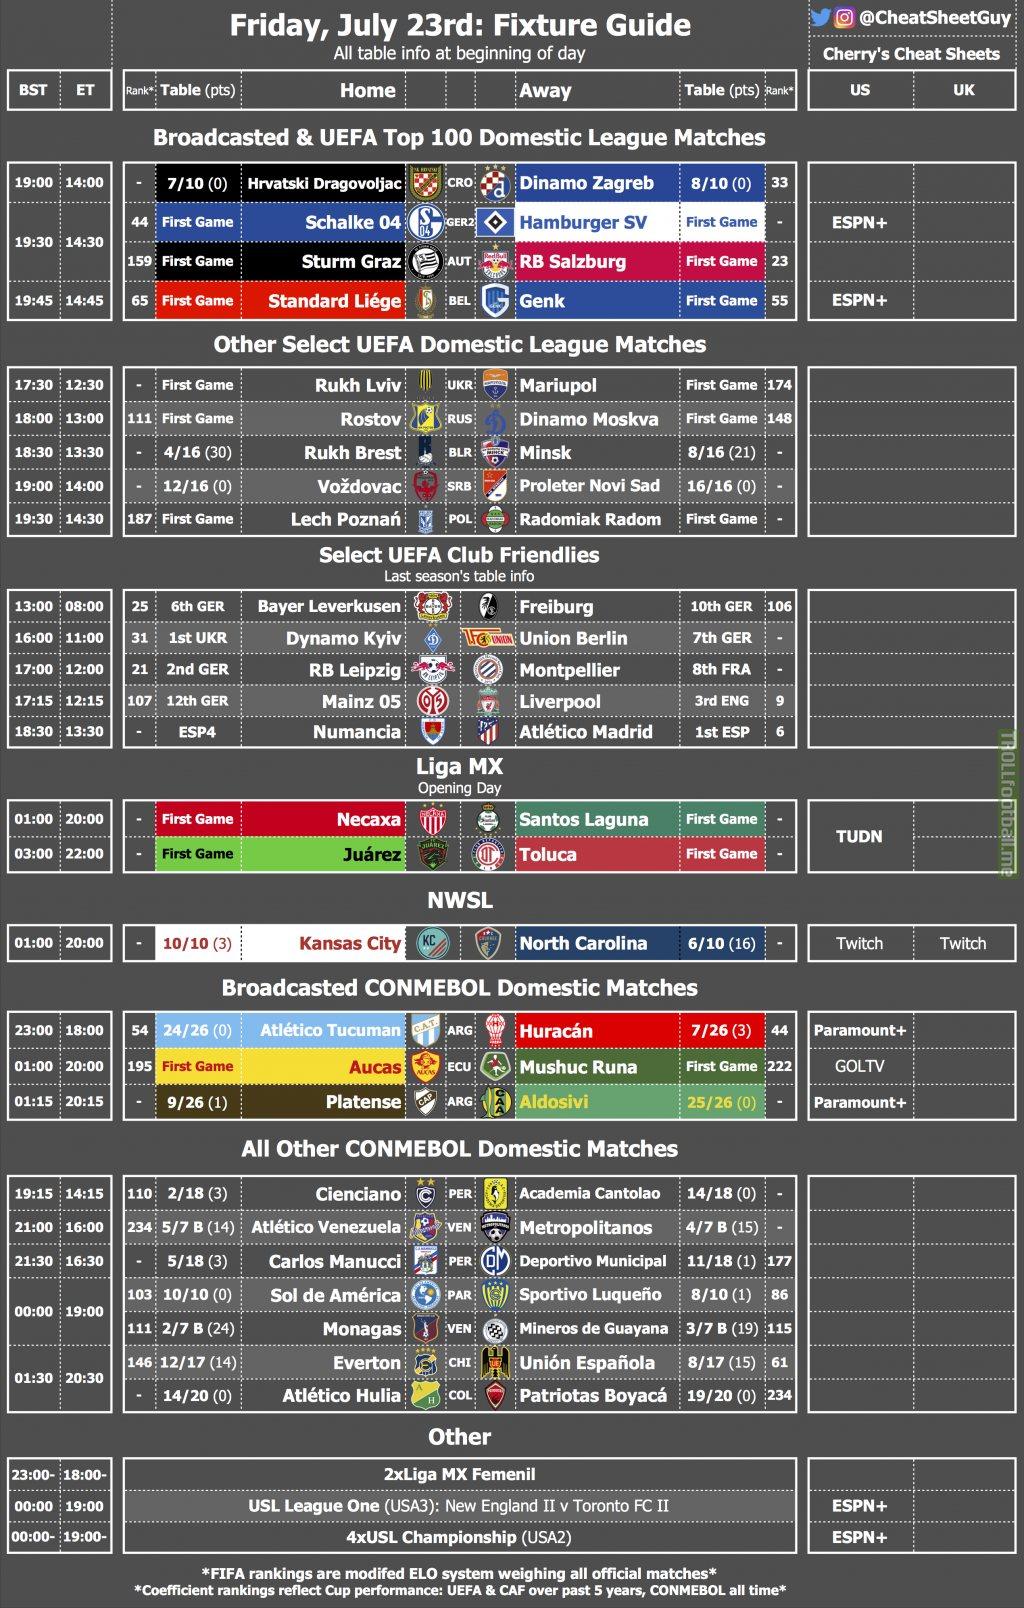 [OC] Cherry's Mega Fixture Cheat Sheet for Friday, July 23rd